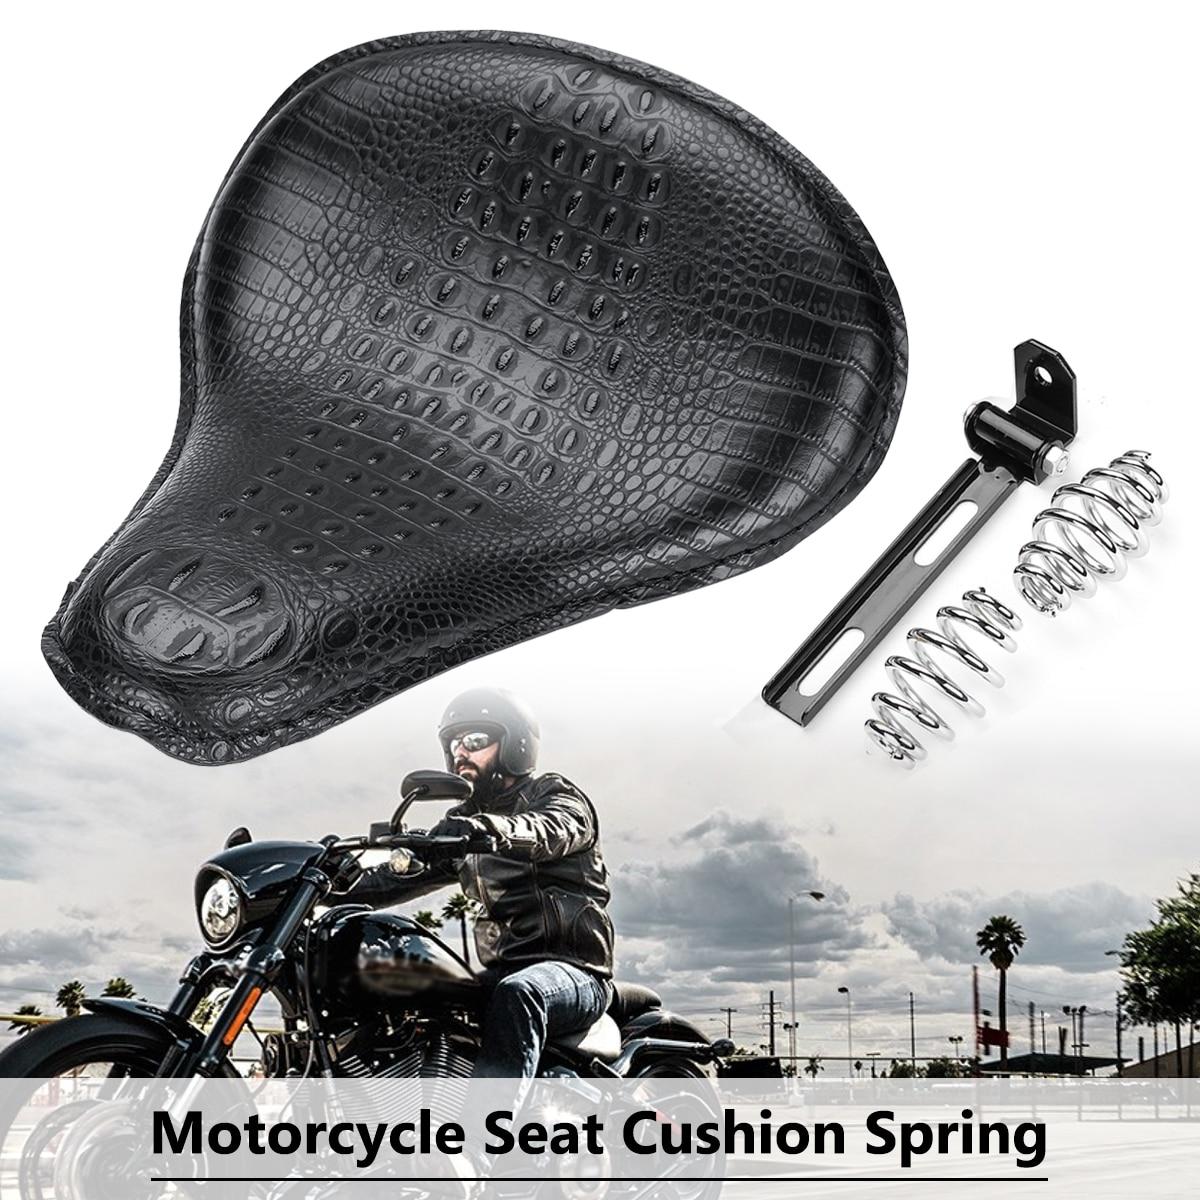 Universal Motorcycle Saddle Solo Seat Cushion Spring Crocodile Leather Style for Harley/Honda/Yamaha/Kawasaki universal motorcycle crocodile leather style saddle solo seat cushion spring for harley honda yamaha kawasaki